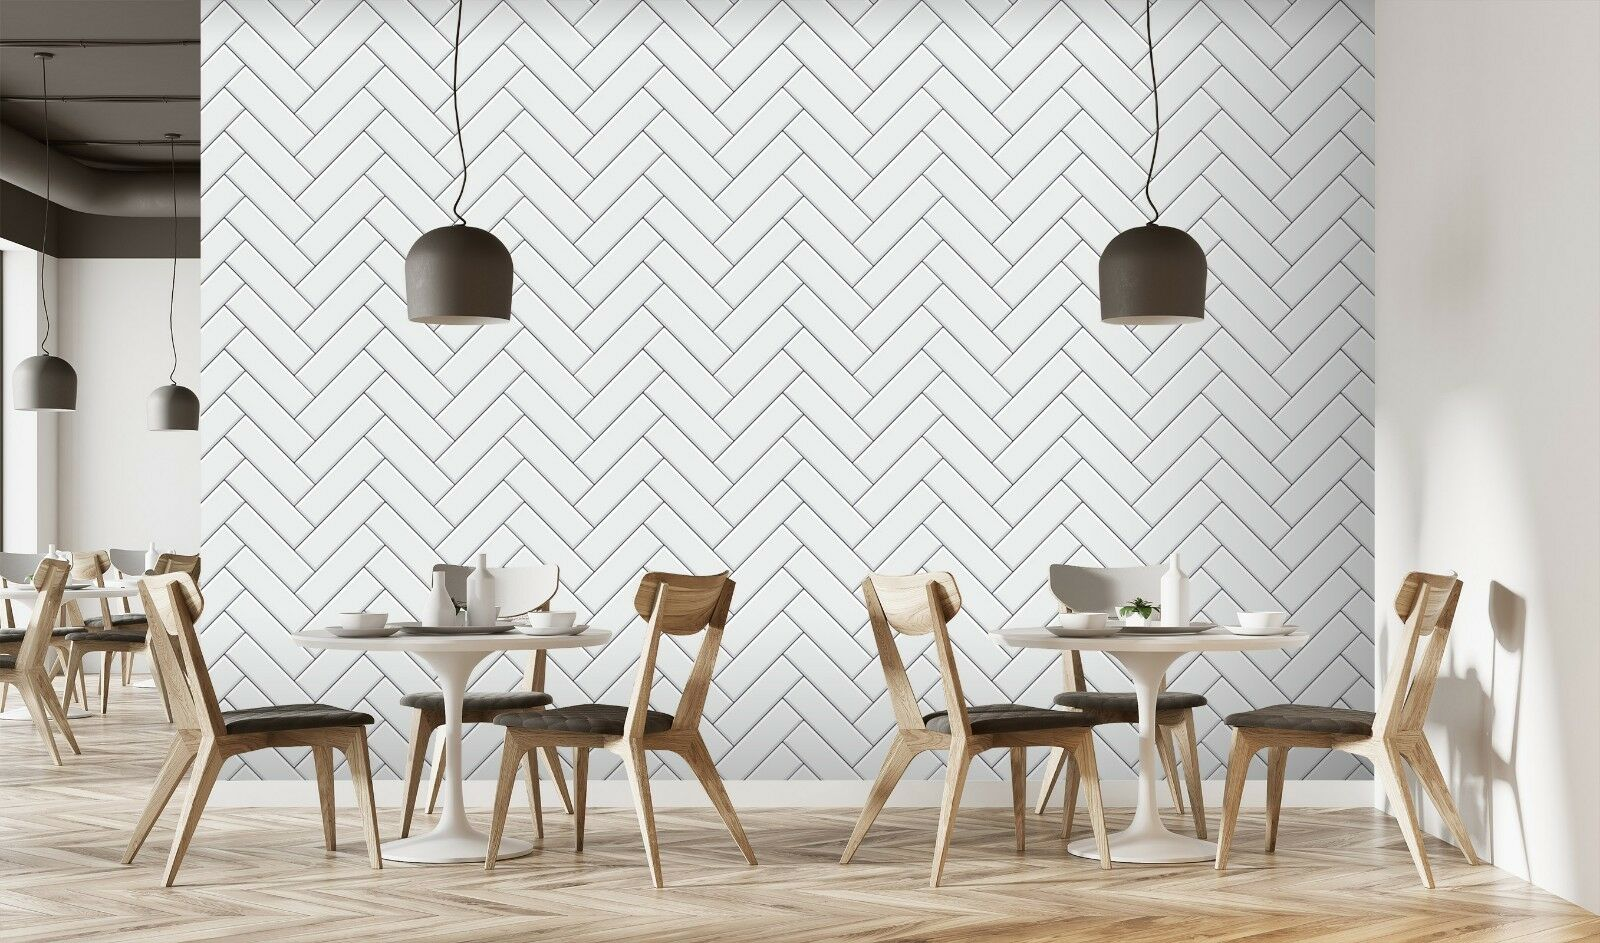 3D Scheint Weiß Ziegel 2 Textur Fliesen Marmor Tapete Abziehbild Tapete Wandbild